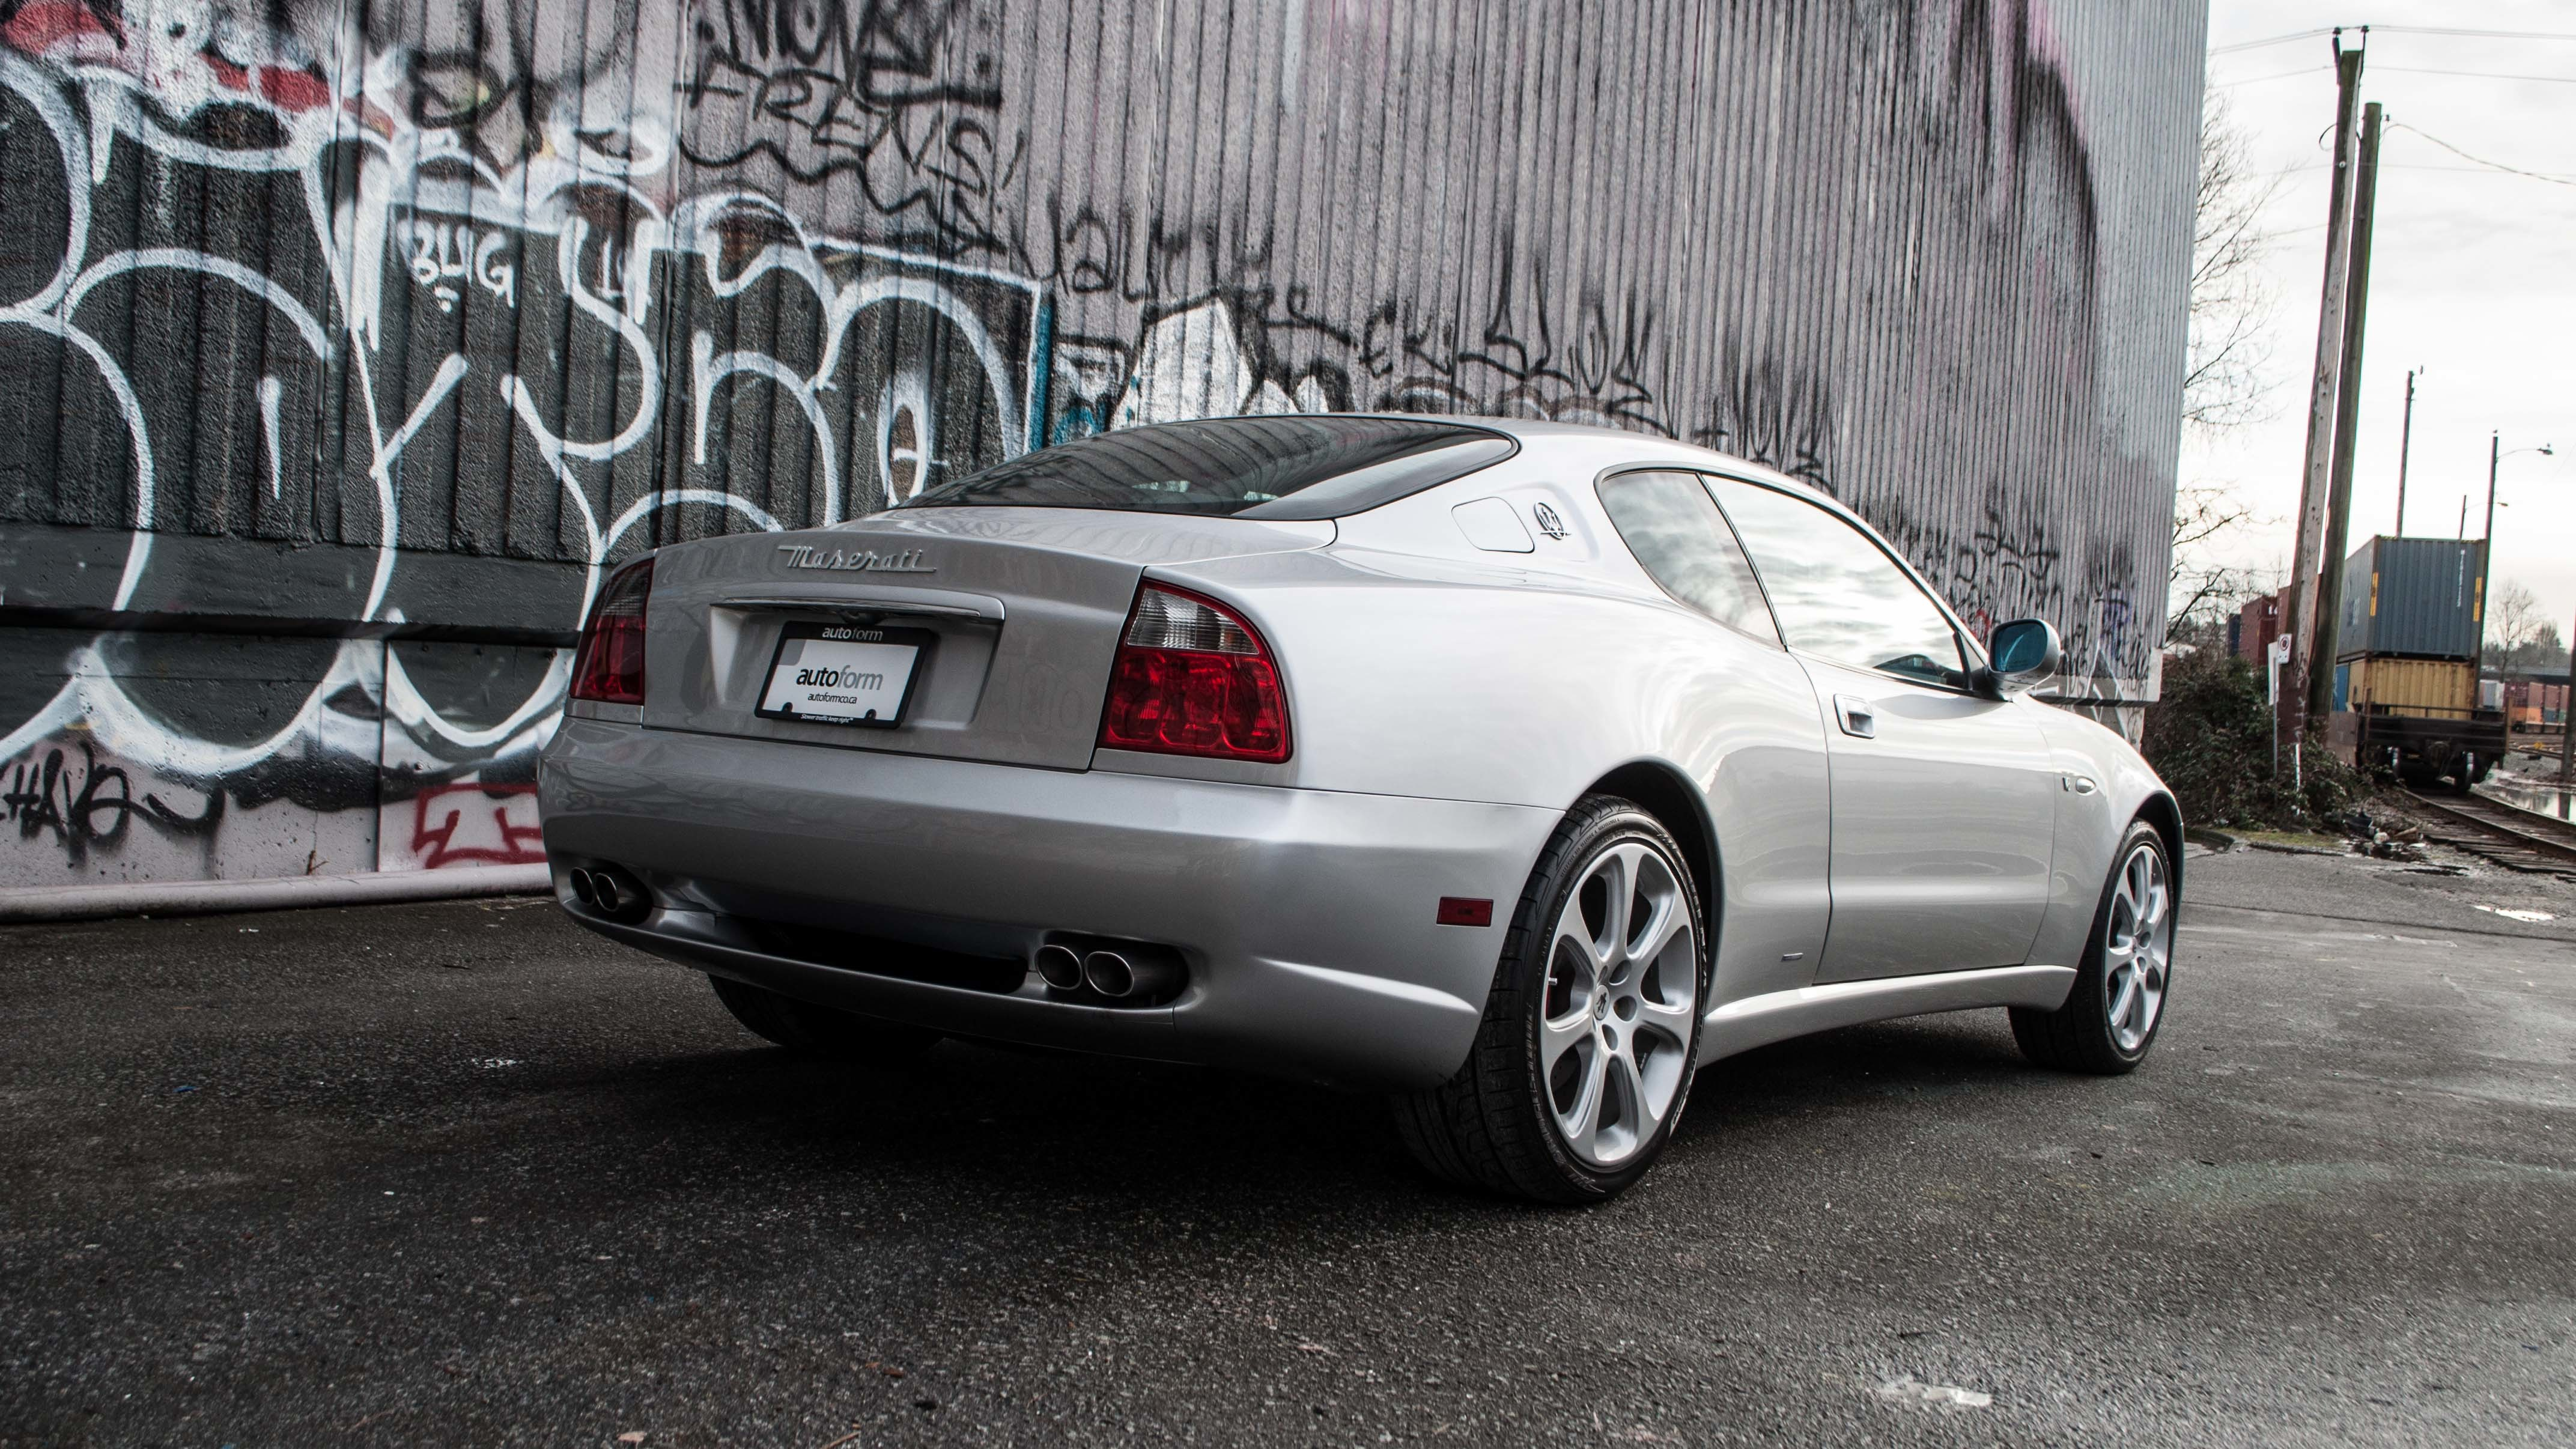 2004 Maserati Coupe | Autoform